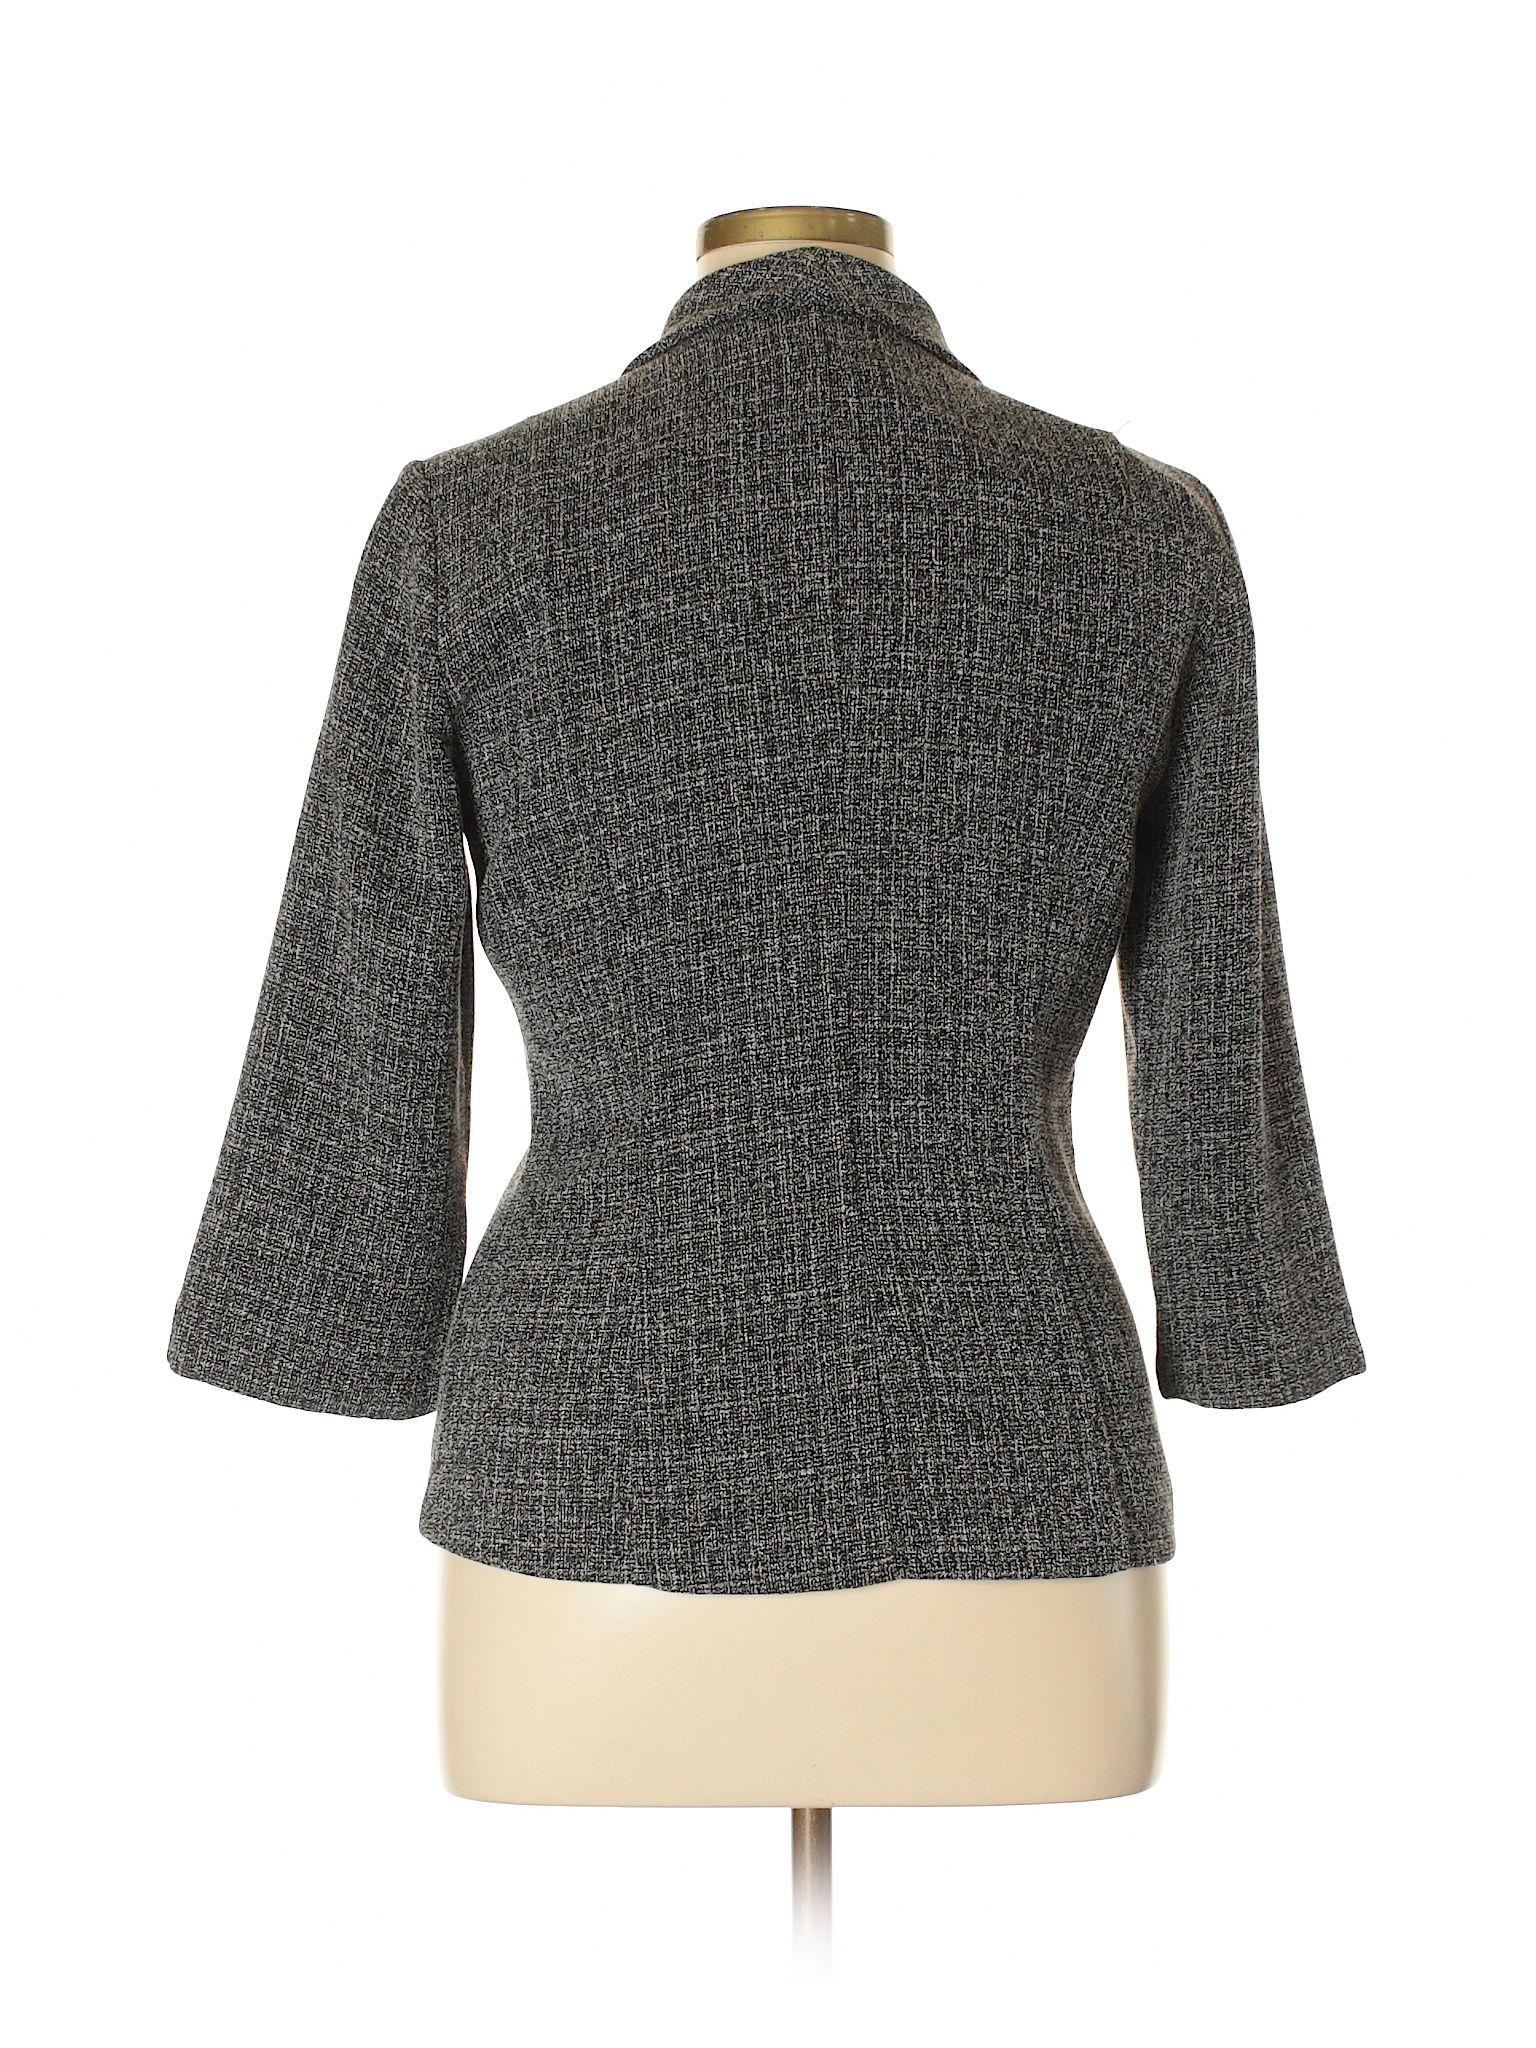 2d7278029f229 Danny And Nicole Blazer: Gray Women's Jackets & Outerwear - 32224318 ...